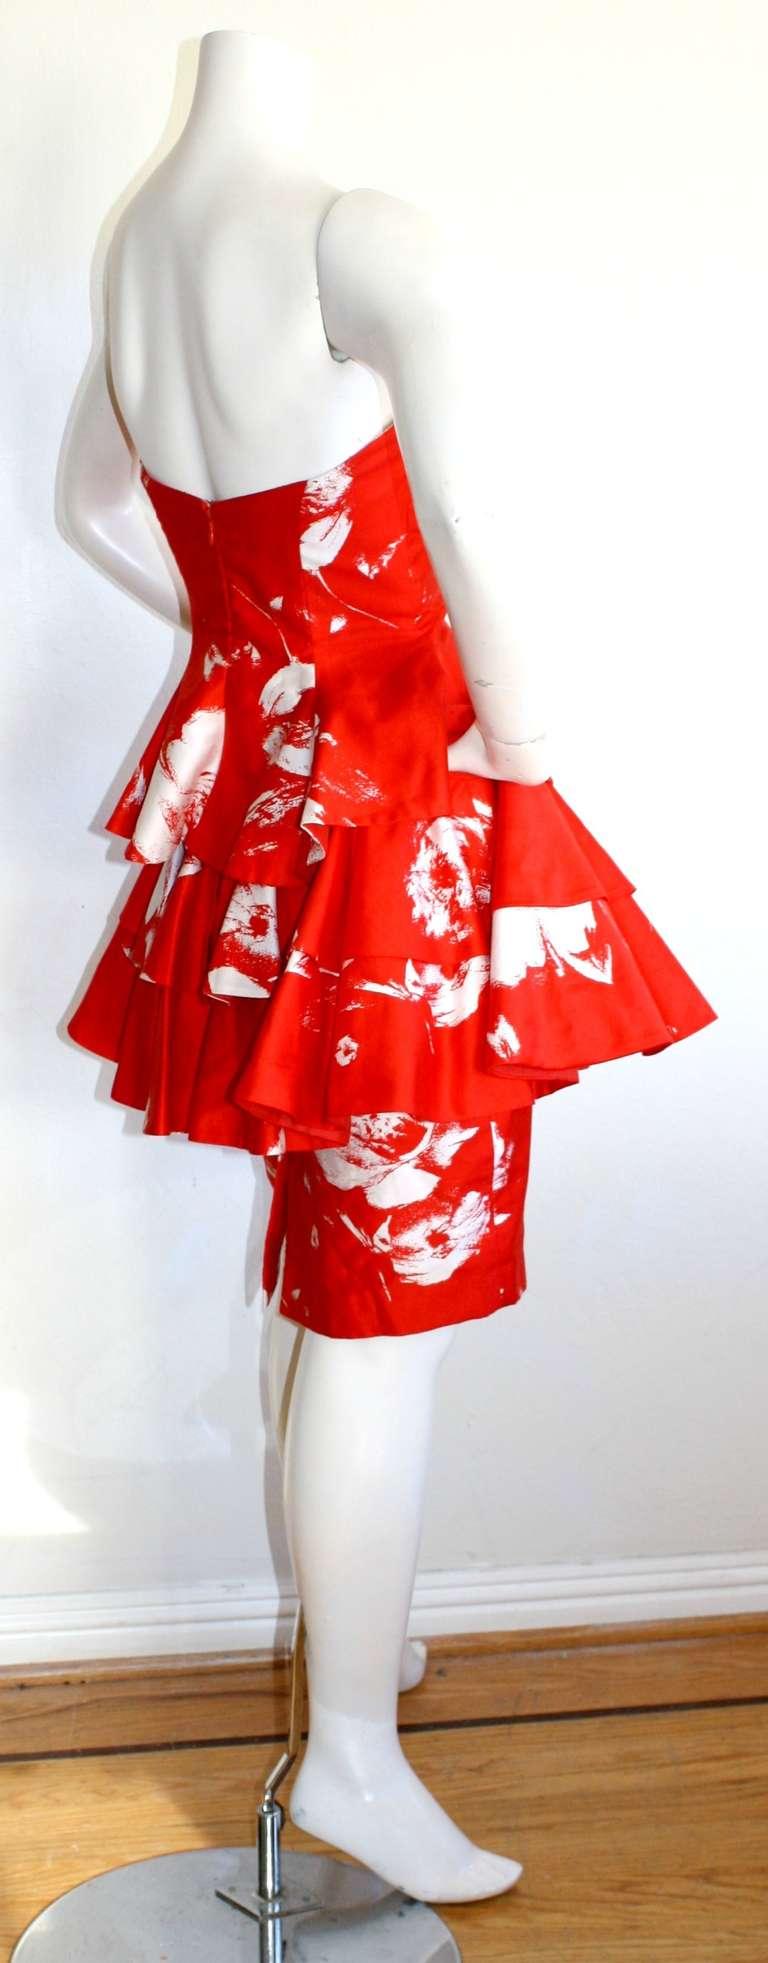 Vintage Barboglio Two Piece Peplum Red Dress Set 3